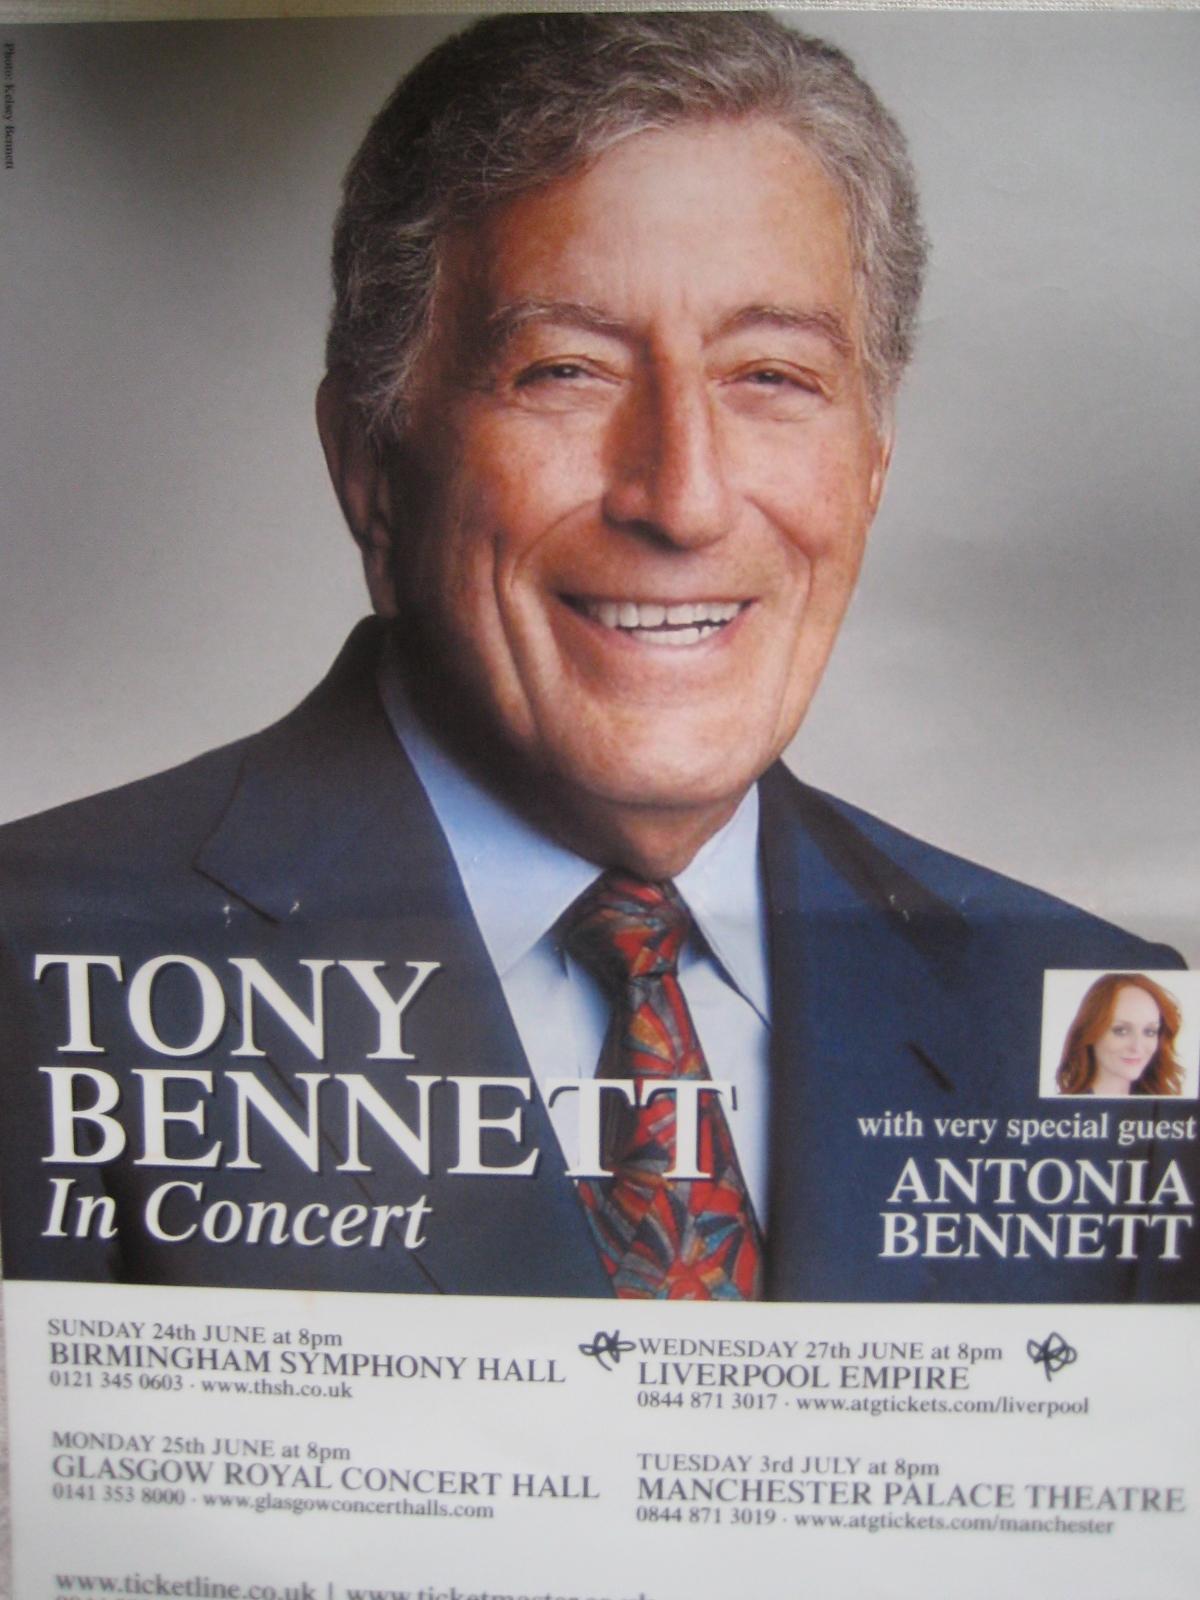 Tony Bennett-Liverpool, June 2012 - tony-bennett-liverpool-2012